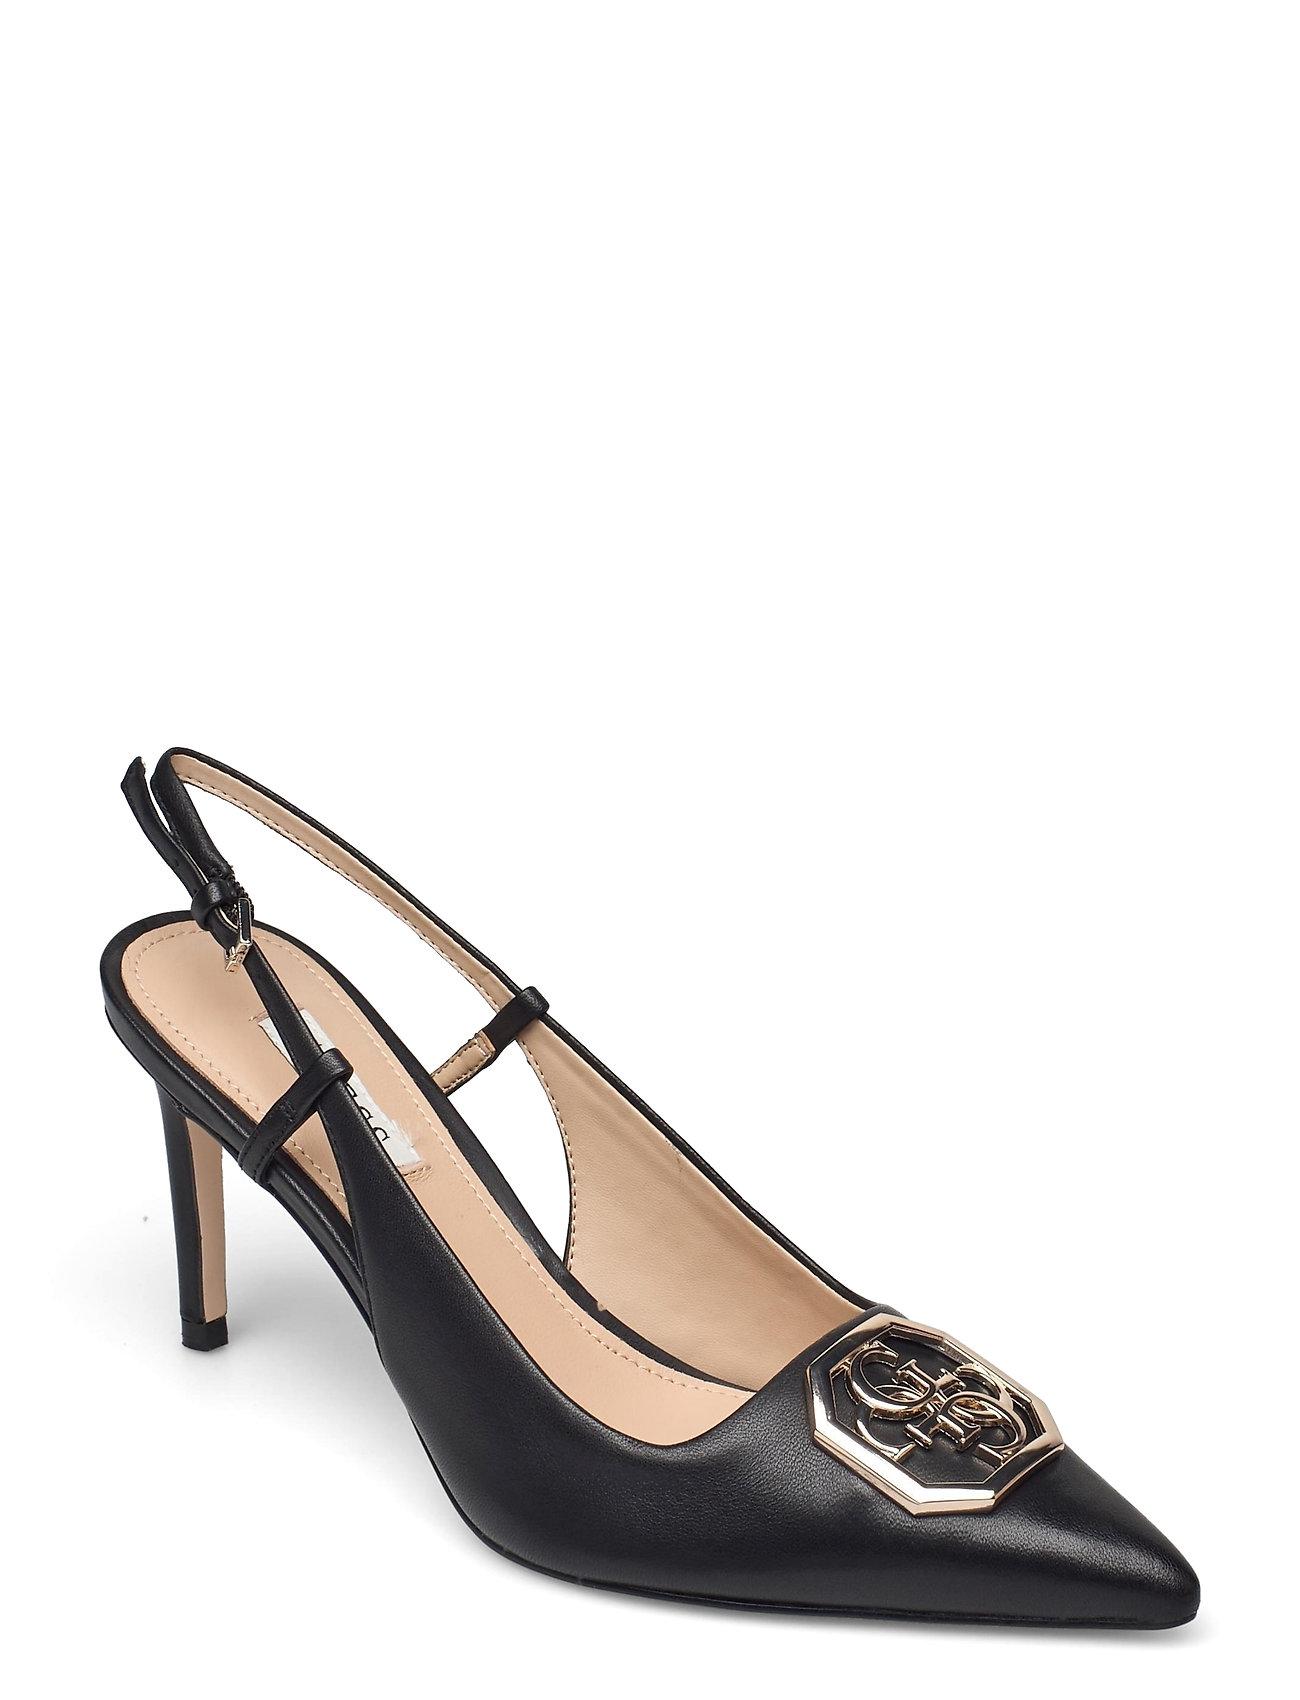 Aleny/Sandalo /Leather Shoes Heels Pumps Sling Backs Sort GUESS